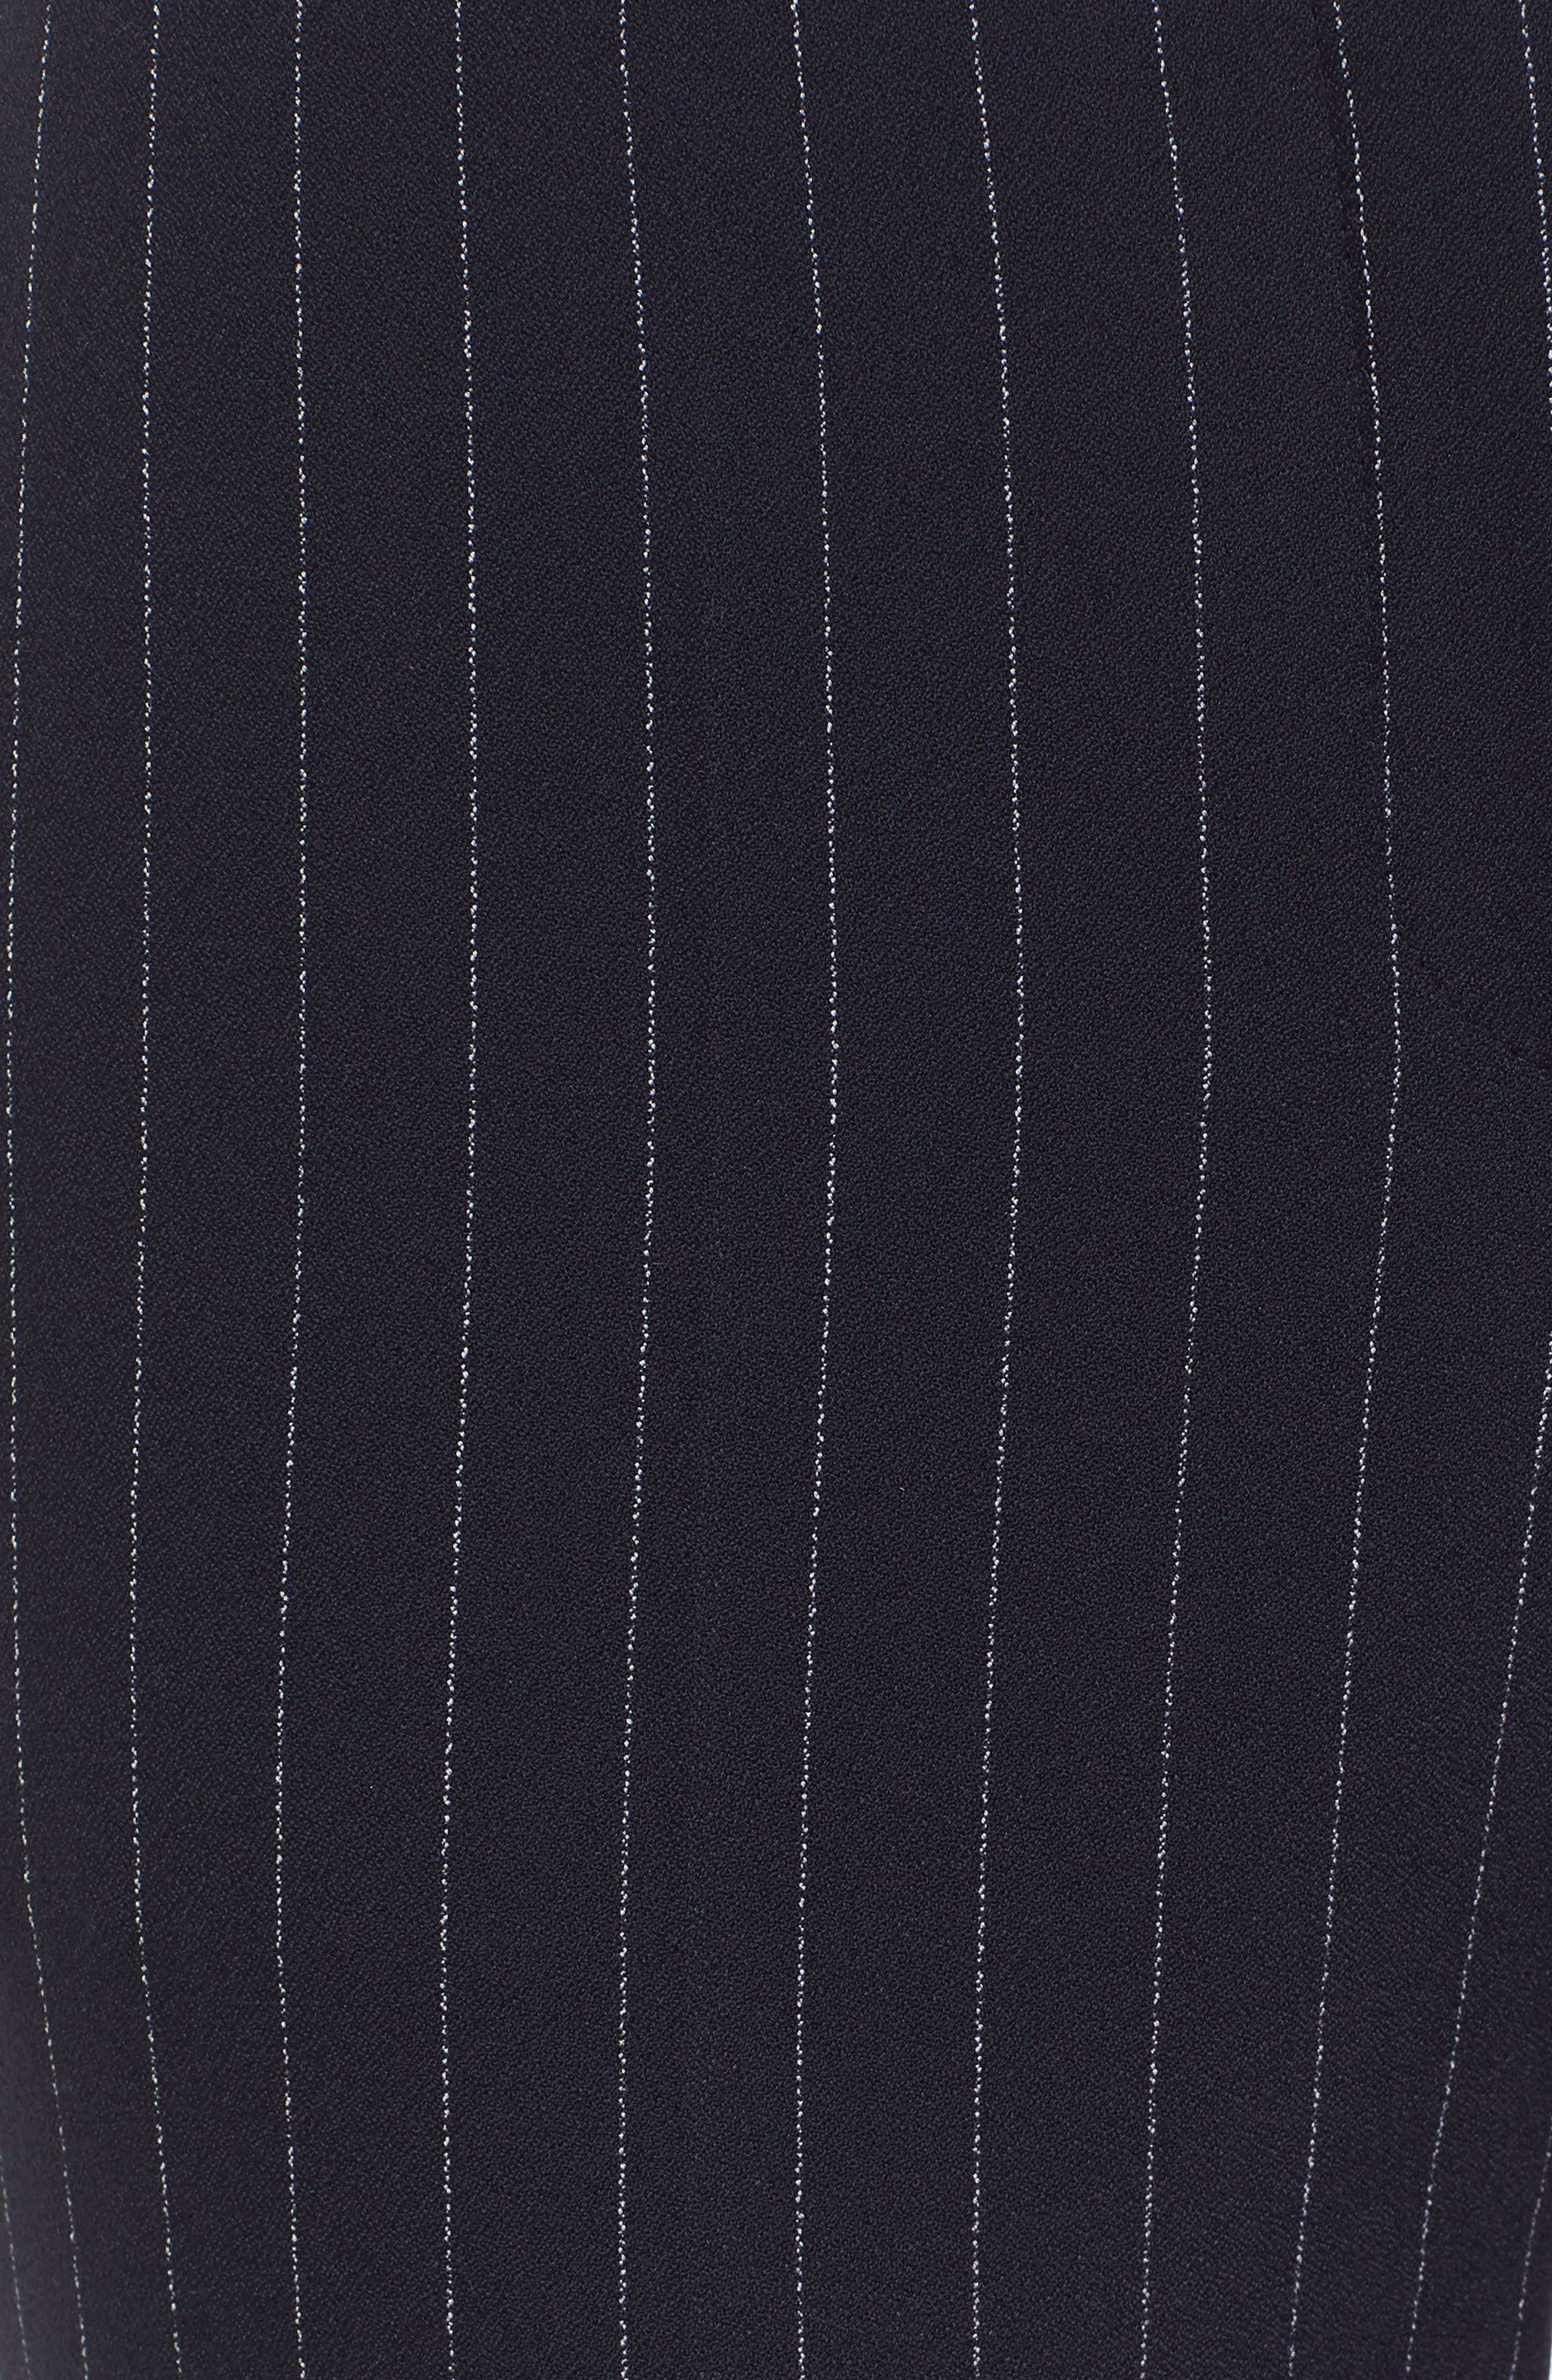 Titana Pinstripe Suit Trousers,                             Alternate thumbnail 7, color,                             Navy Fantasy